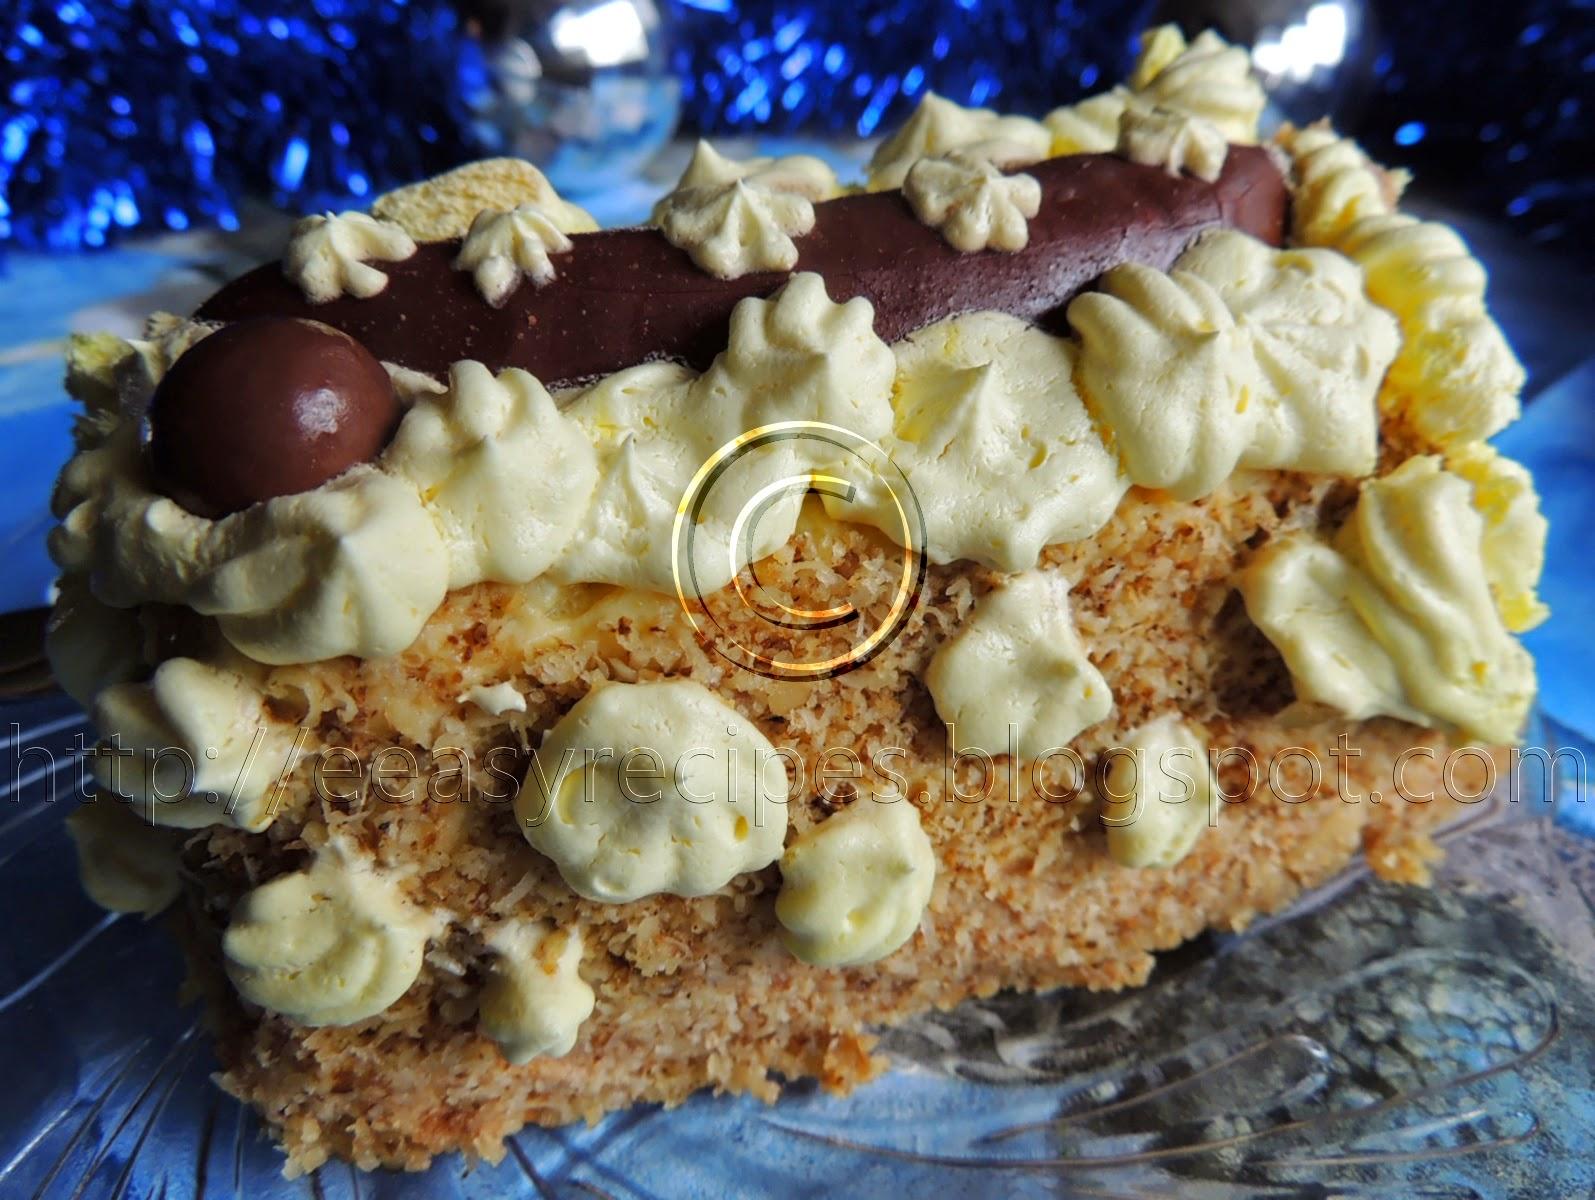 Unbaked cake with ladyfingers